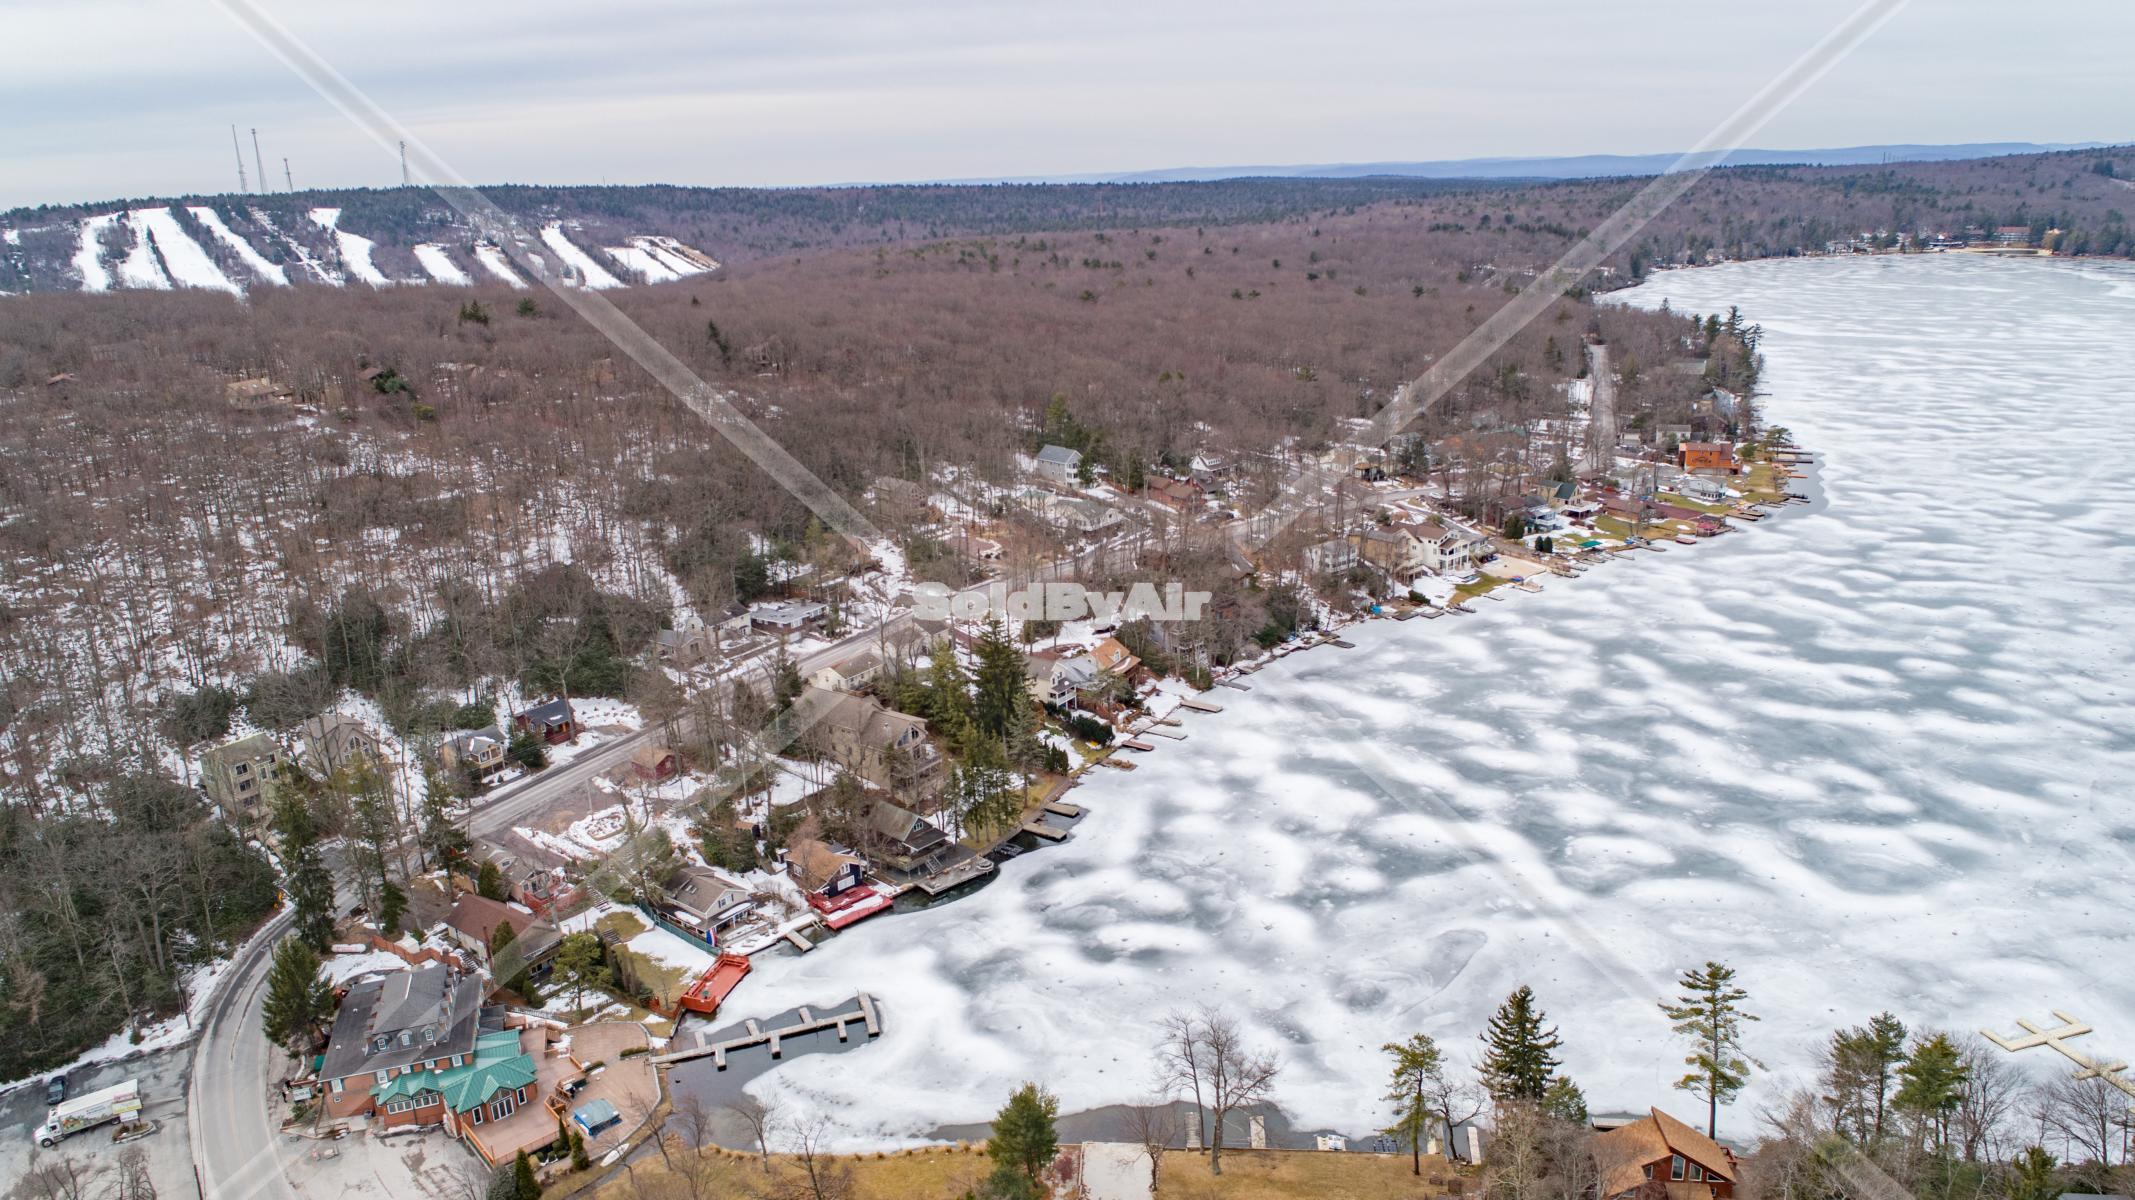 Drone Photo of Lake Harmony & Big Boulder in Lake Harmony Pennsylvania